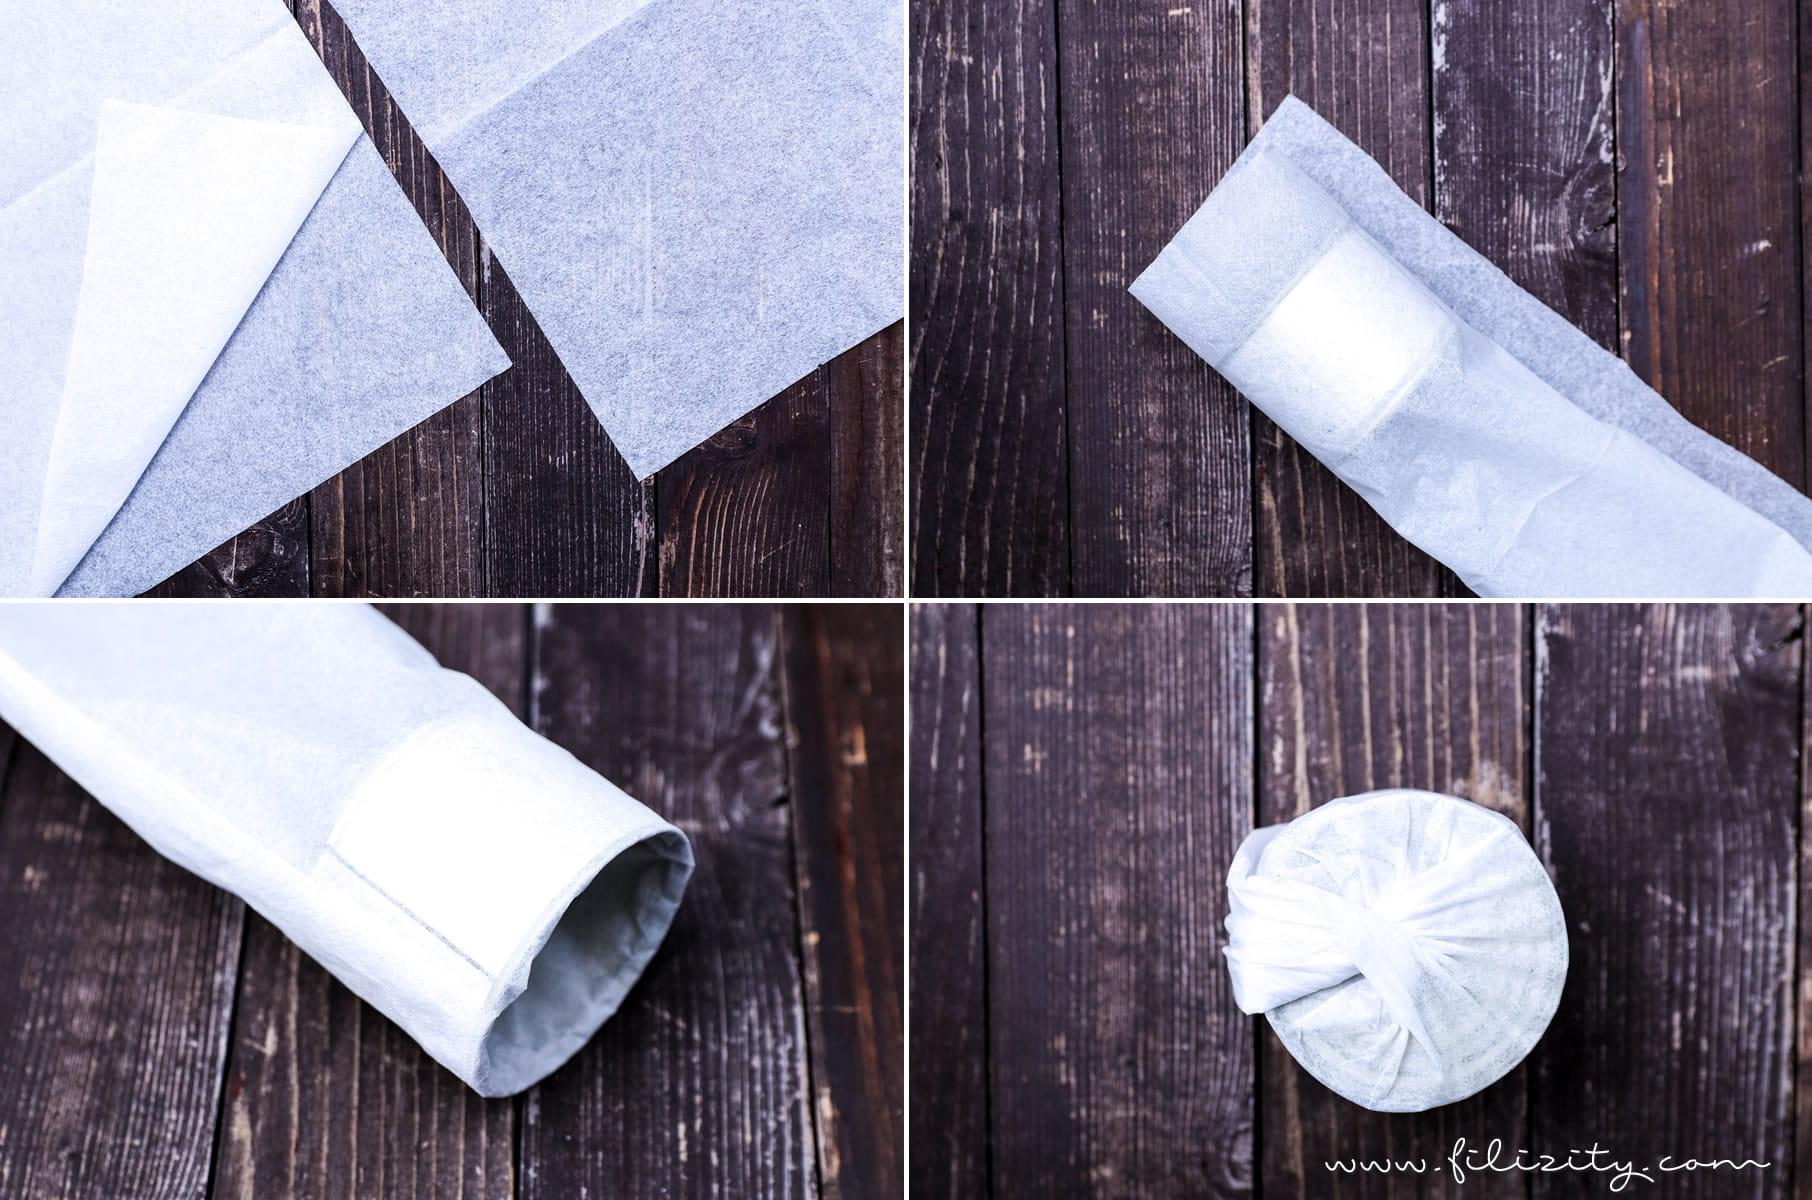 recycling adventskalender basteln aus alten dosen. Black Bedroom Furniture Sets. Home Design Ideas